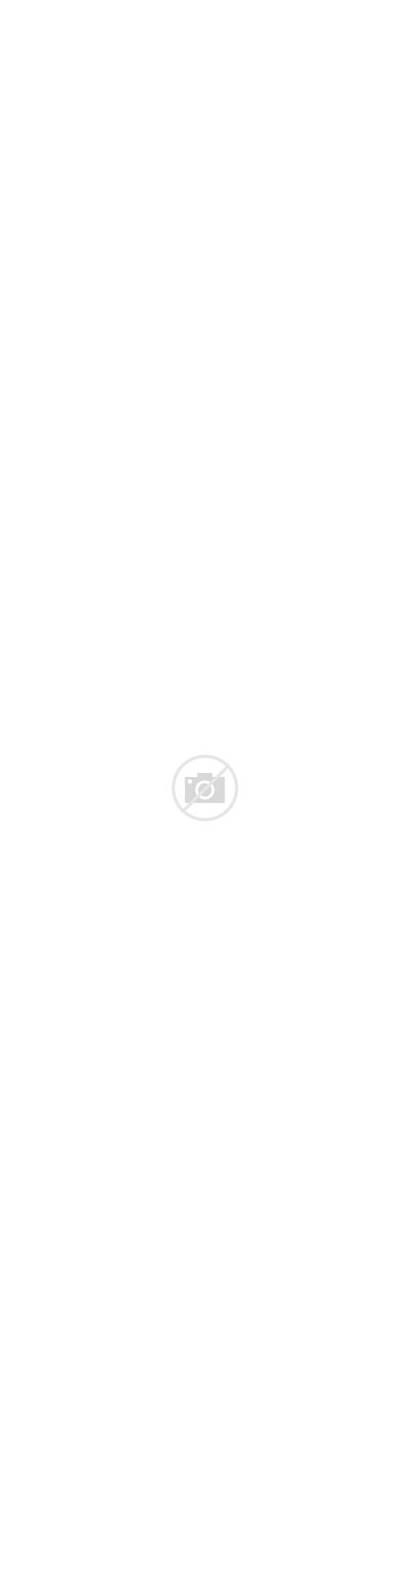 Private Penelope Bourbon Select Barrel Strength Rose